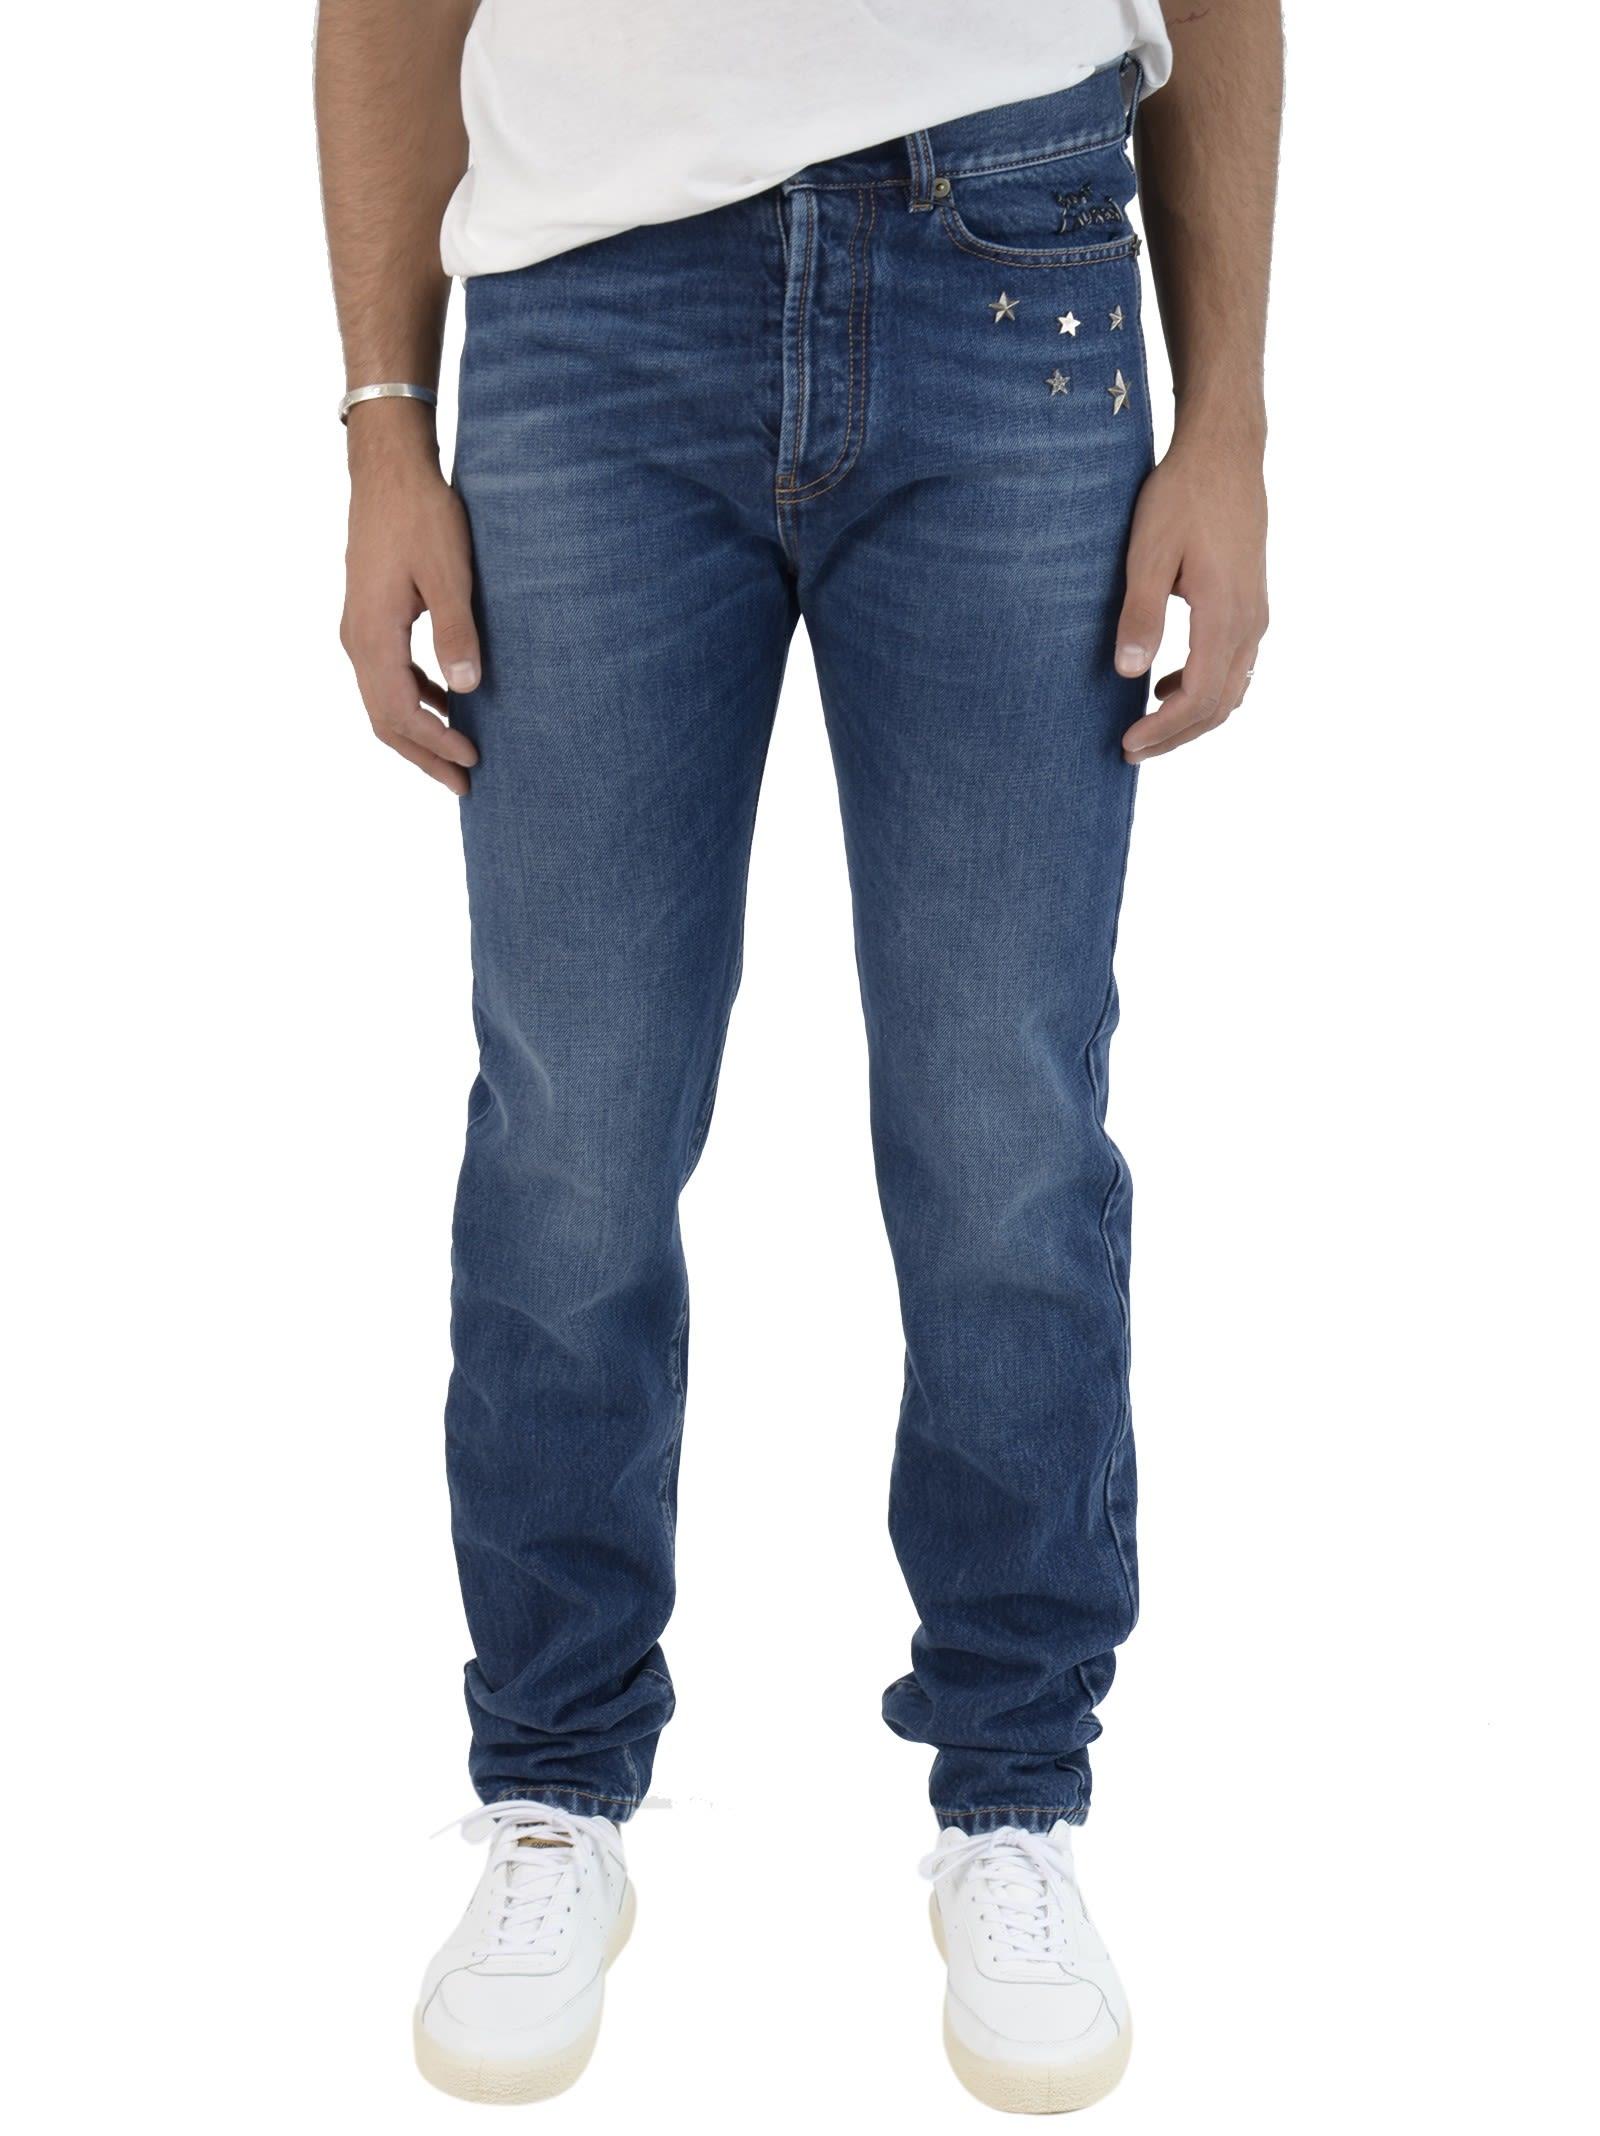 Saint Laurent Dark Blue Stars Jeans 9039142